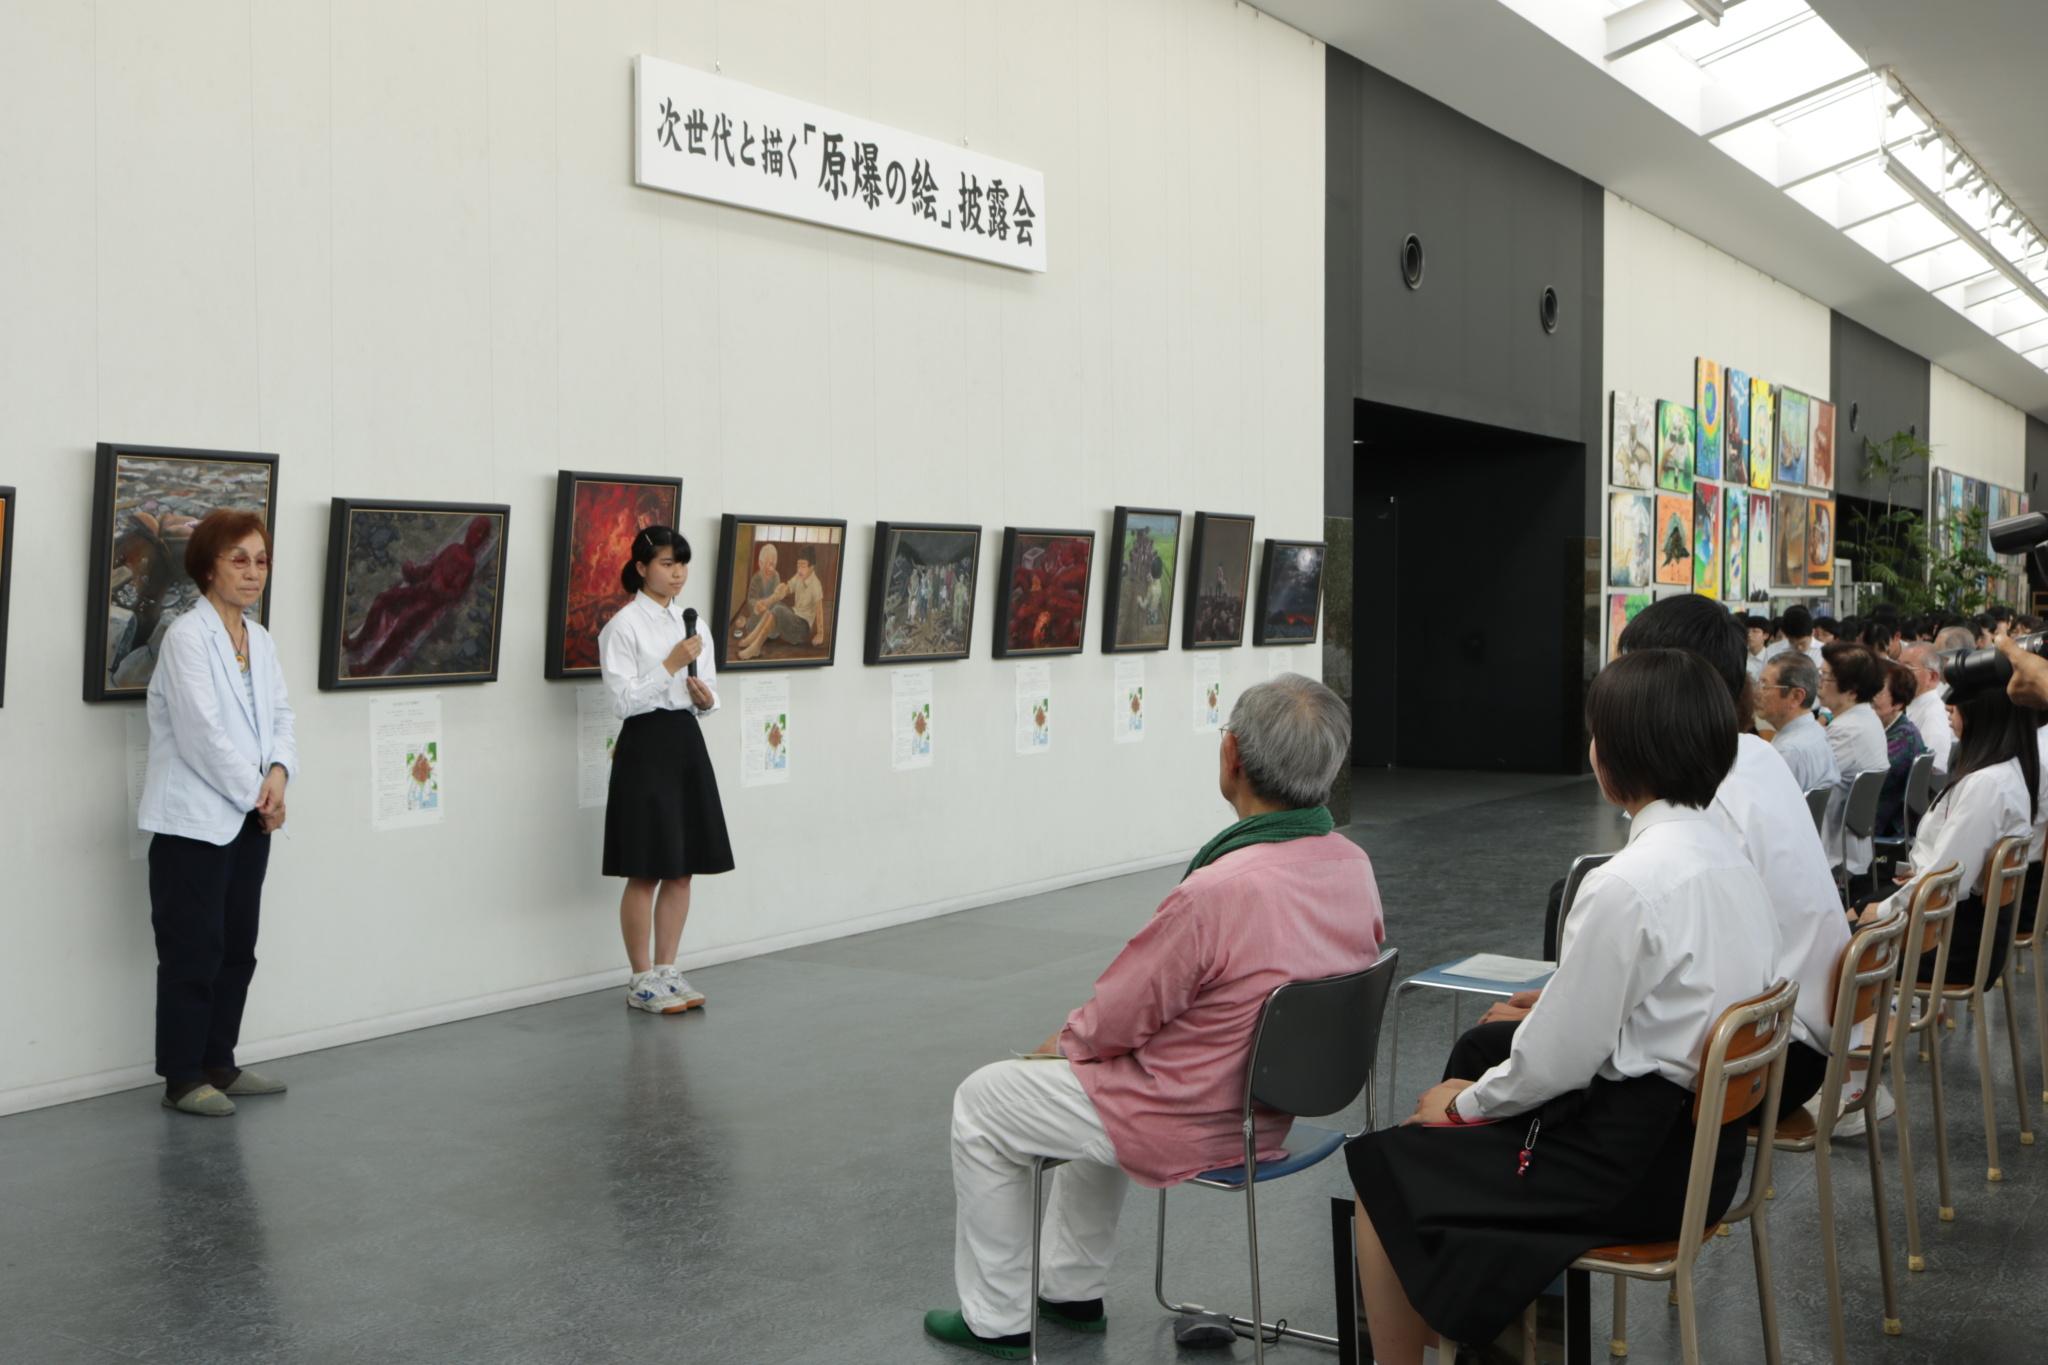 次世代と描く原爆の絵 | 広島市立基町高等学校 普通科 創造表現コース